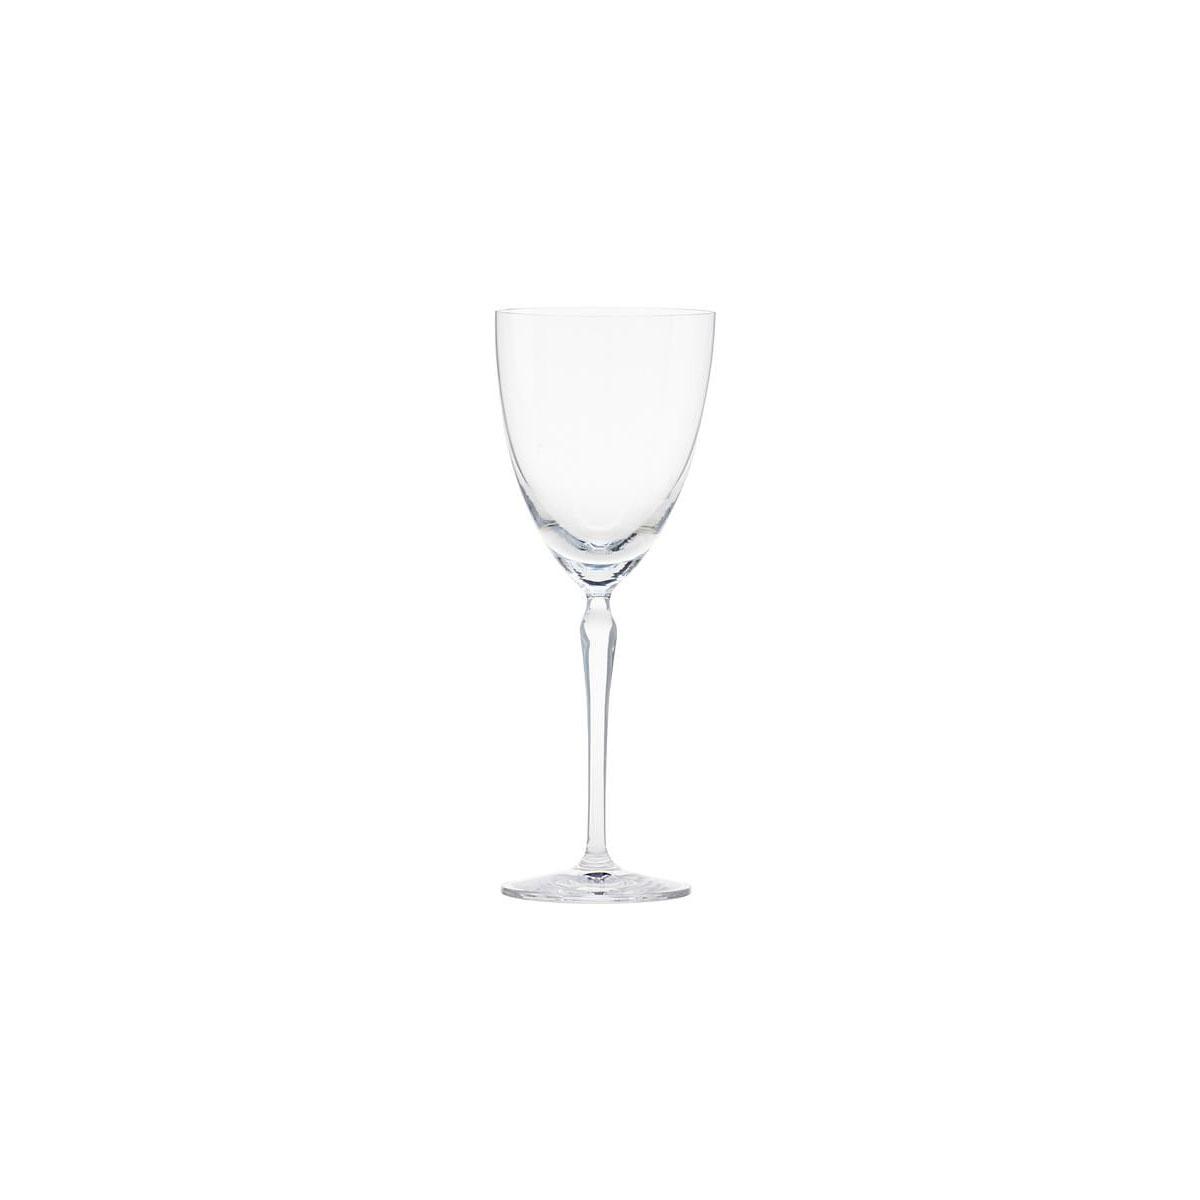 Schott Zwiesel Tritan Crystal, Audrey Crystal White Wine Glass, Single